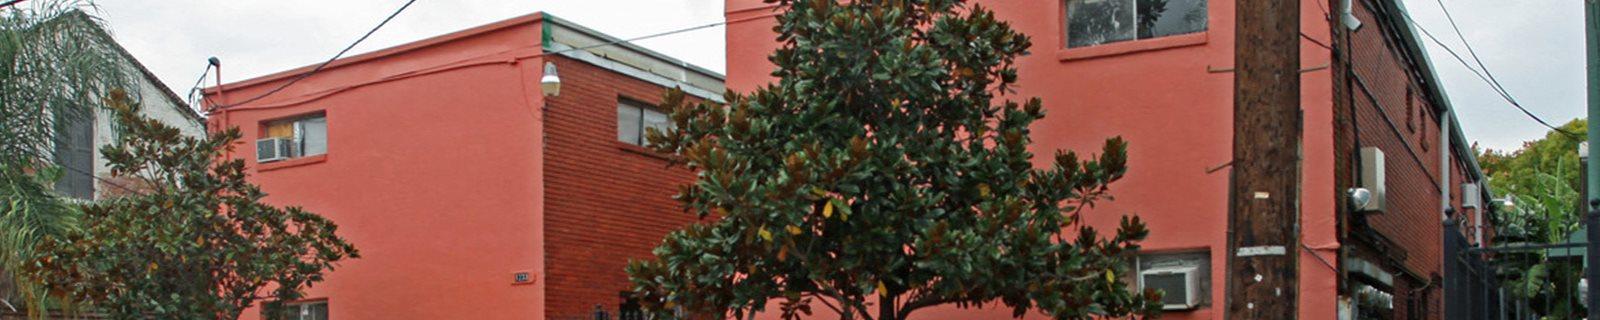 Marais St Apartments - A Cypress Communities Property